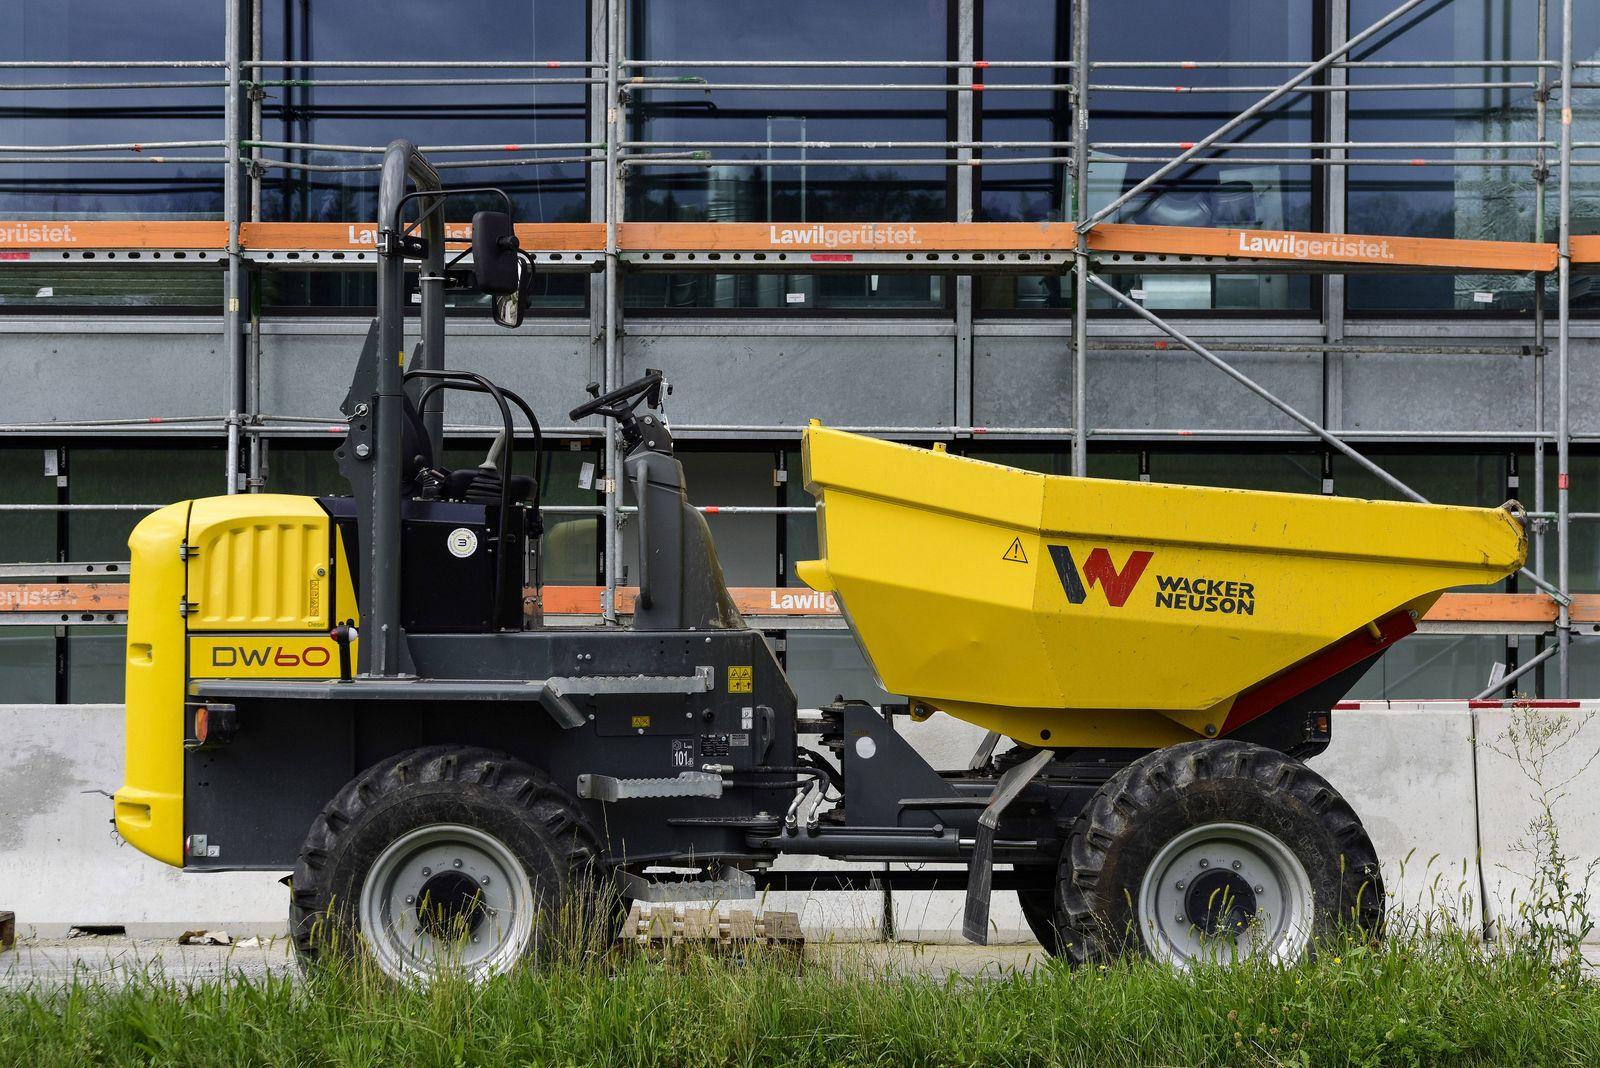 Raddumper DW60 Wacker Neuson Cham Schweiz 15 08 2019 *** Wheel dumper DW60 Wacker Neuson Cham